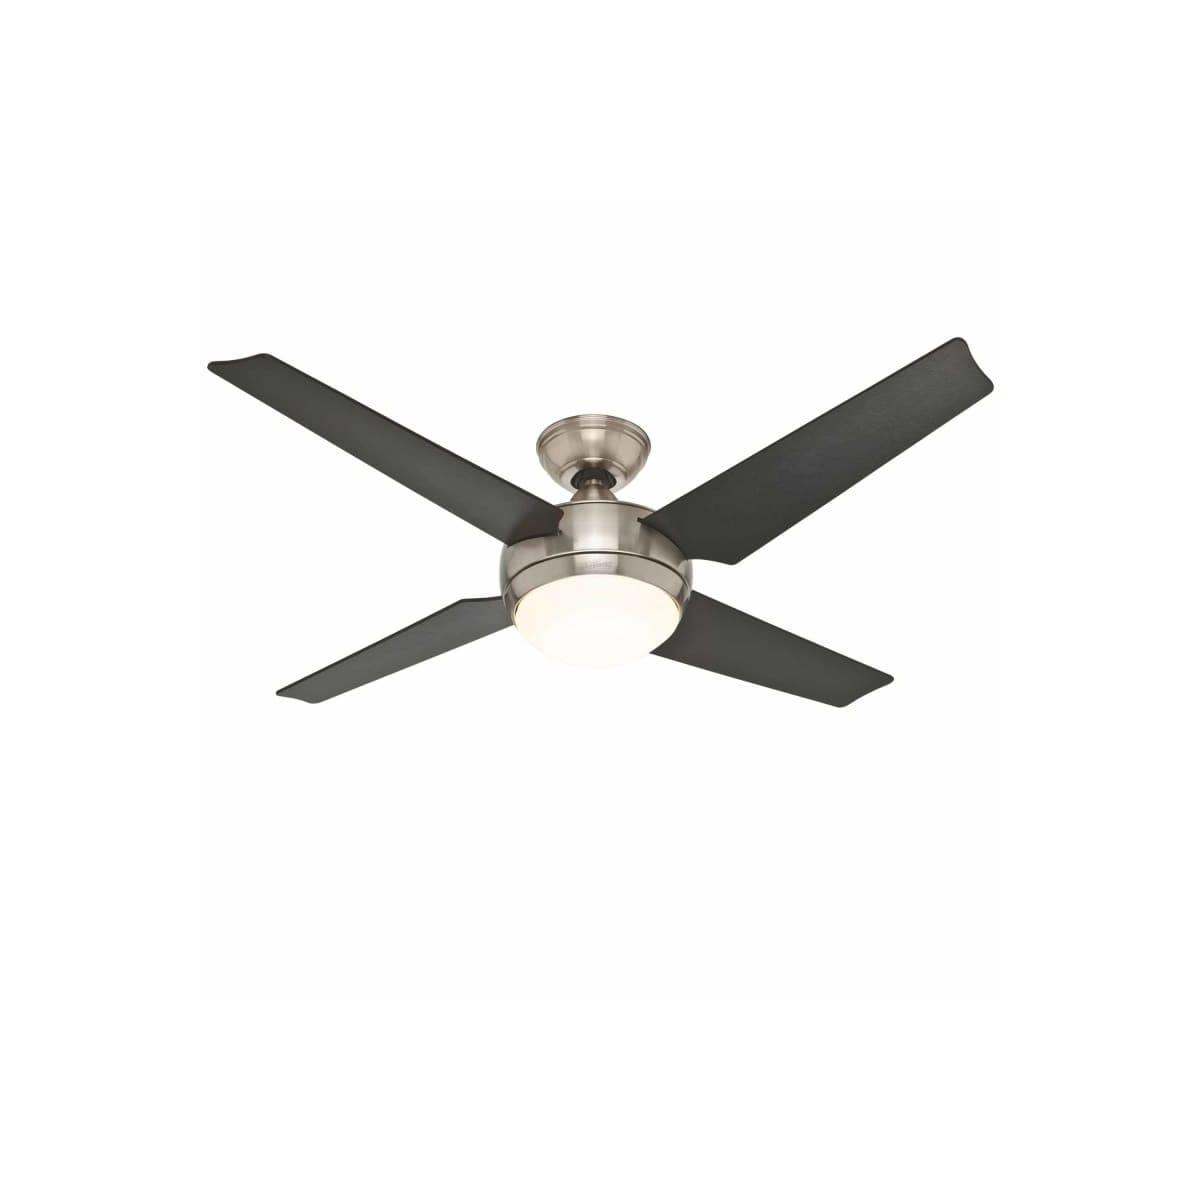 Hunter 59072 Brushed Nickel 52 Indoor Ceiling Fan 4 Reversible Blades Led Light Kit And Remote Control Included Lightingshowplace Com